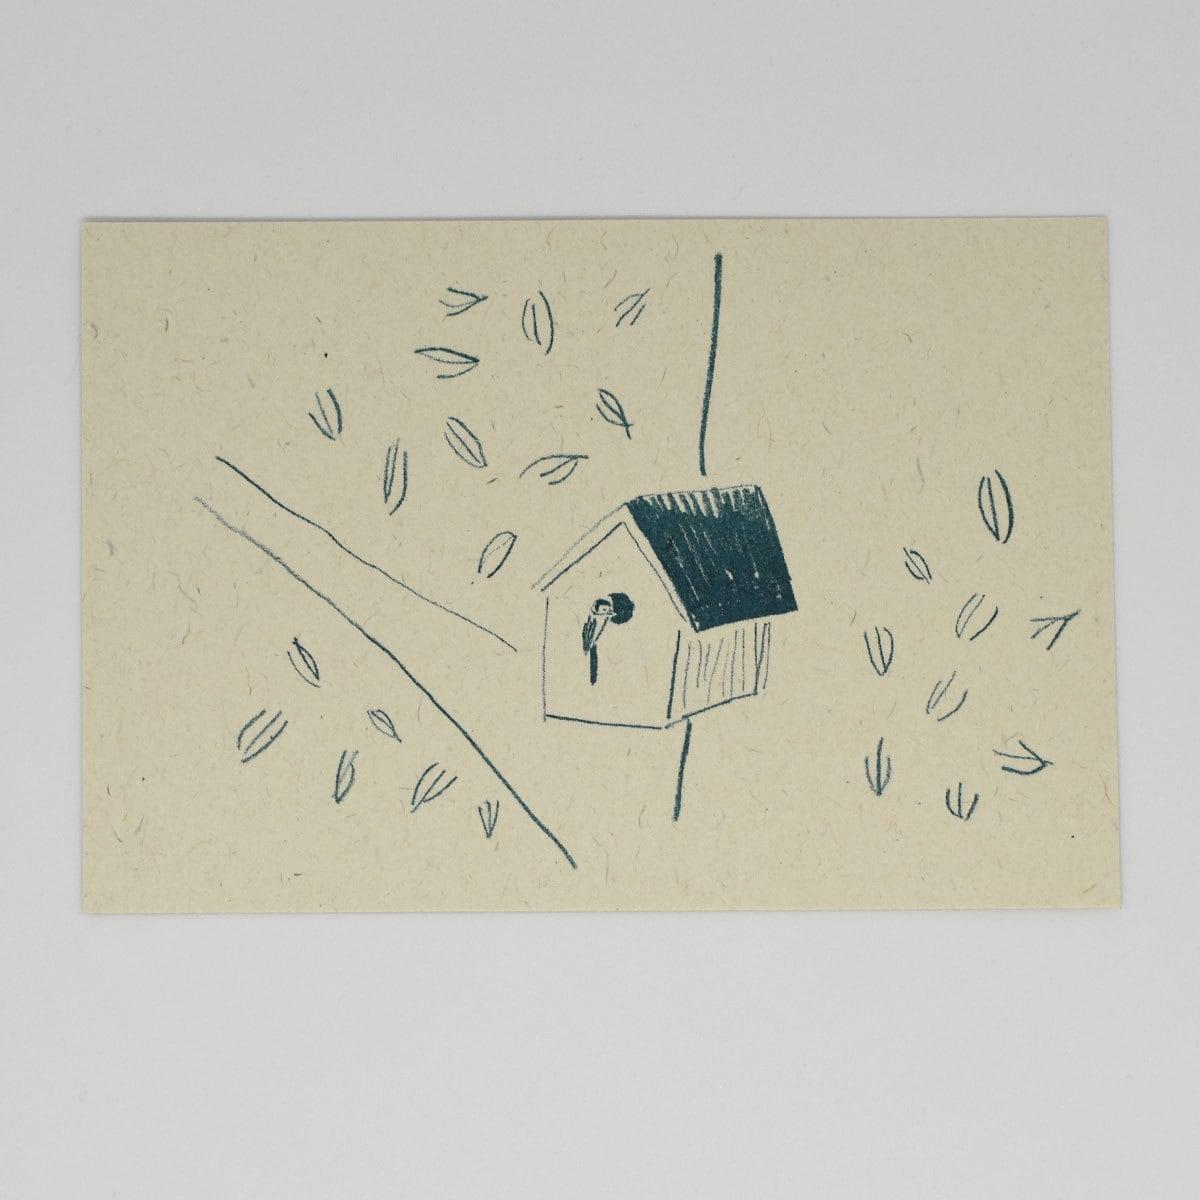 HIGASHI ALPS(ヒガシアルプス)ポストカード 巣箱と野鳥